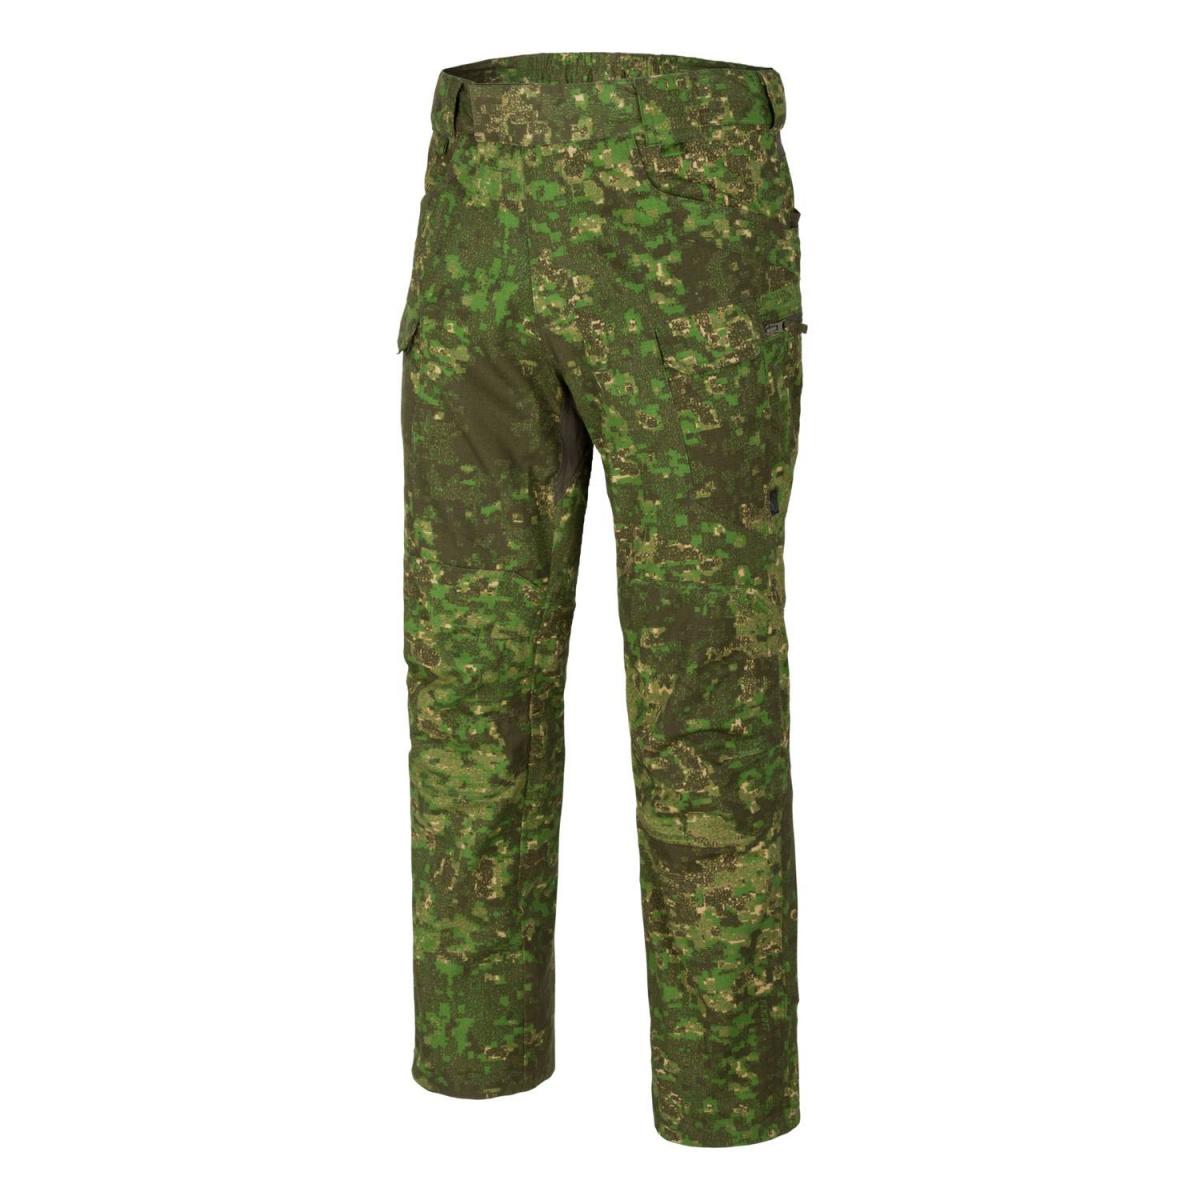 Kalhoty UTP FLEX PENCOTT® WILDWOOD® - zvìtšit obrázek